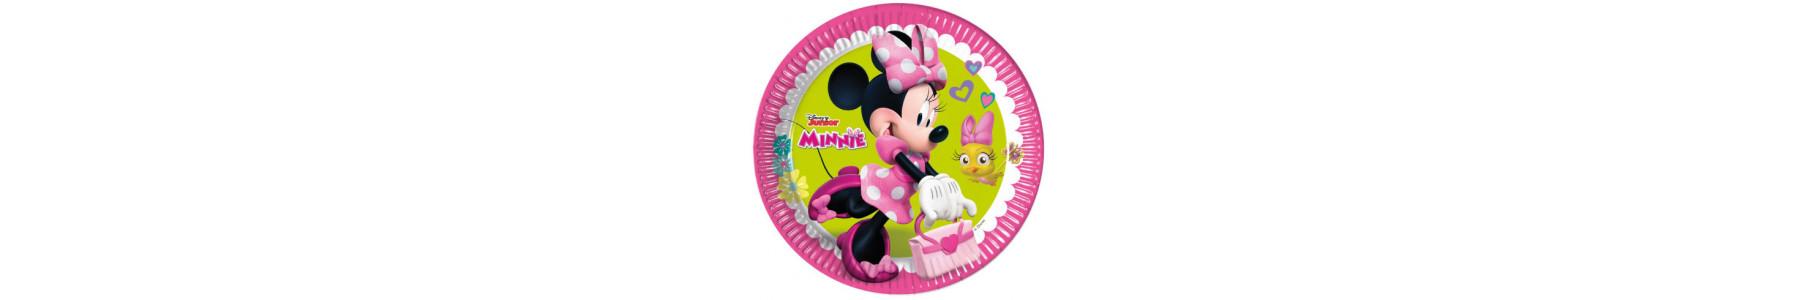 Articole de petrecere compostabile gama Minnie Unicorn Dreams